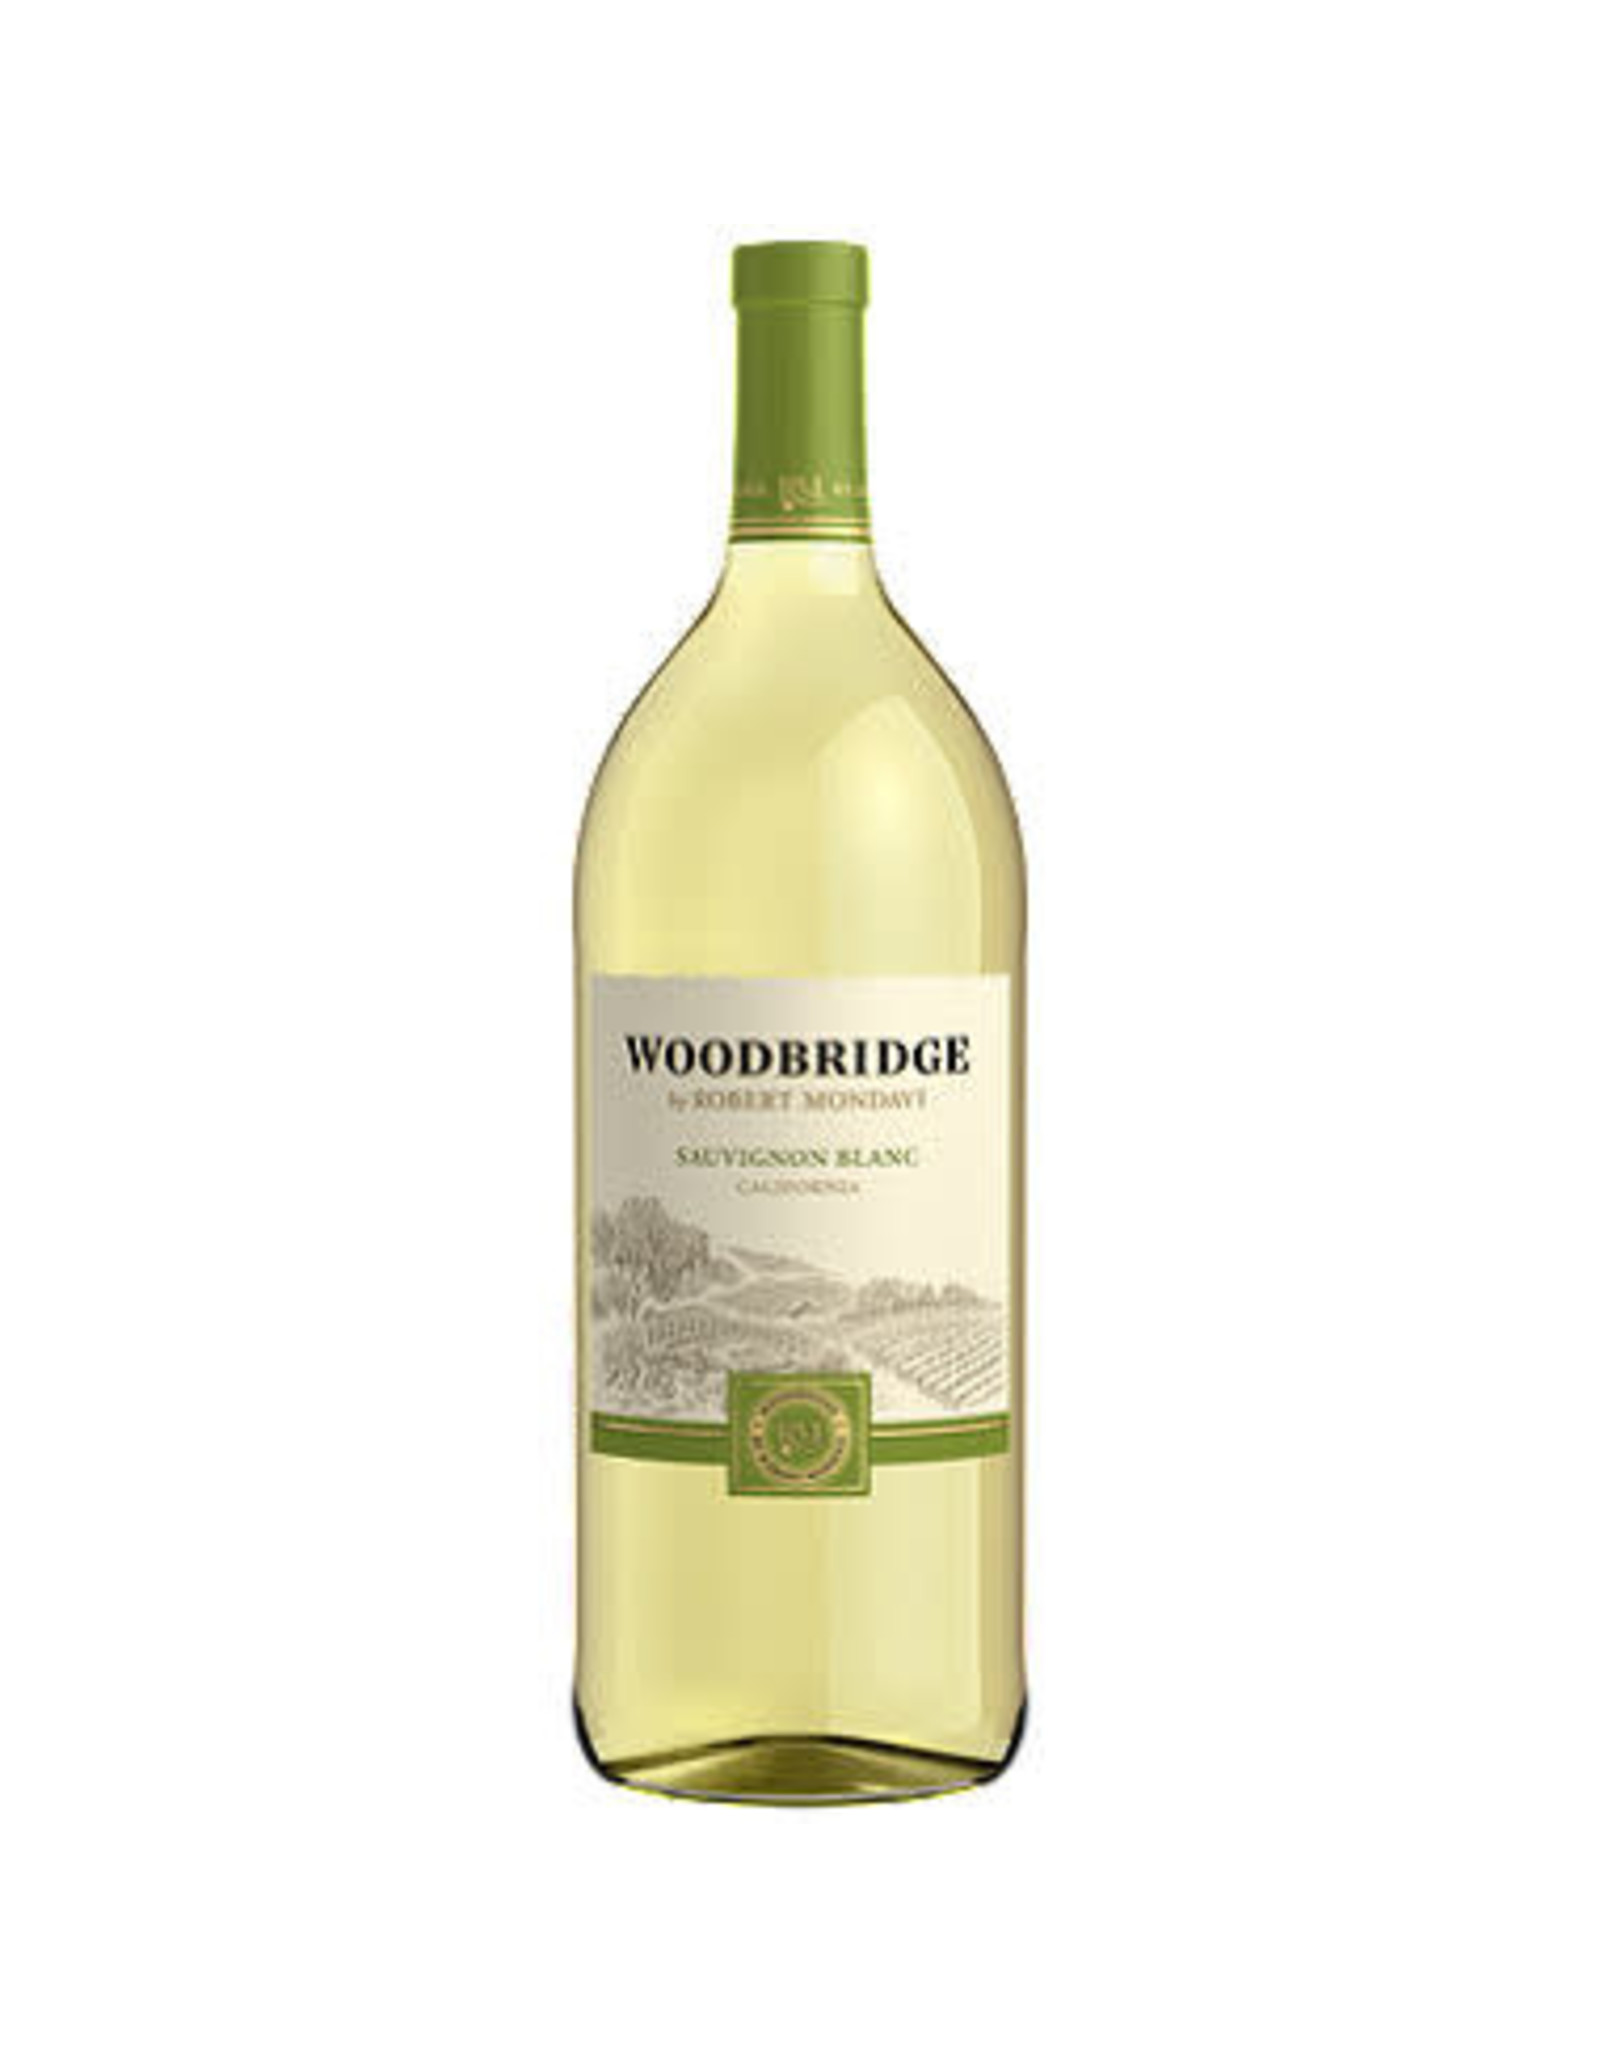 WOODBRIDGE SAUVIGNON BLANC 1.5L